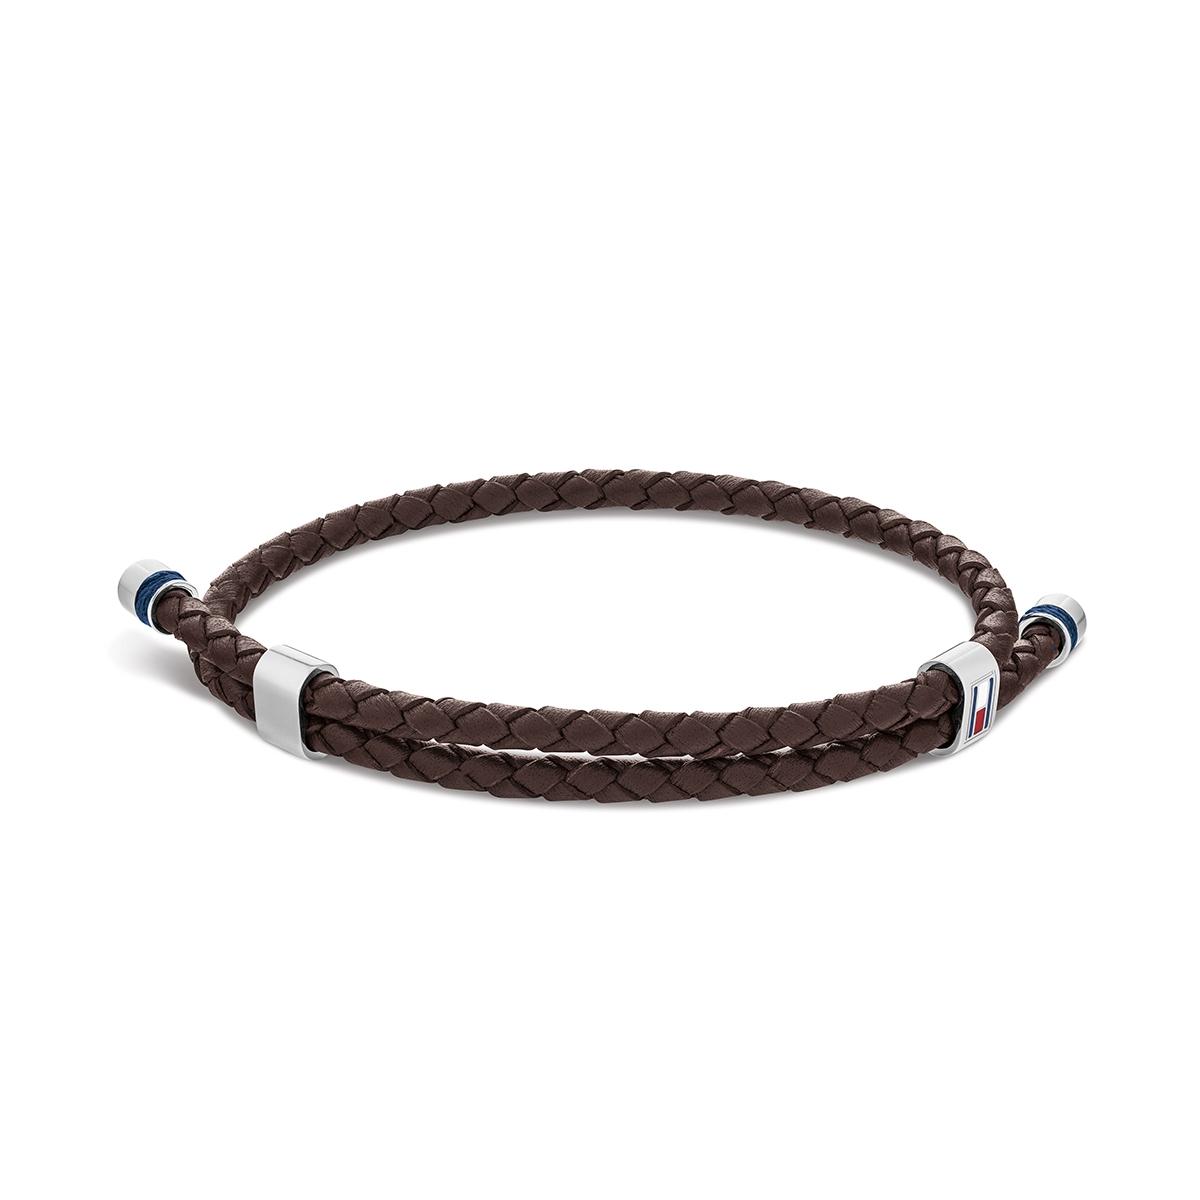 Denim bracelet TJ2790223 - Tommy hilfiger - Modalova